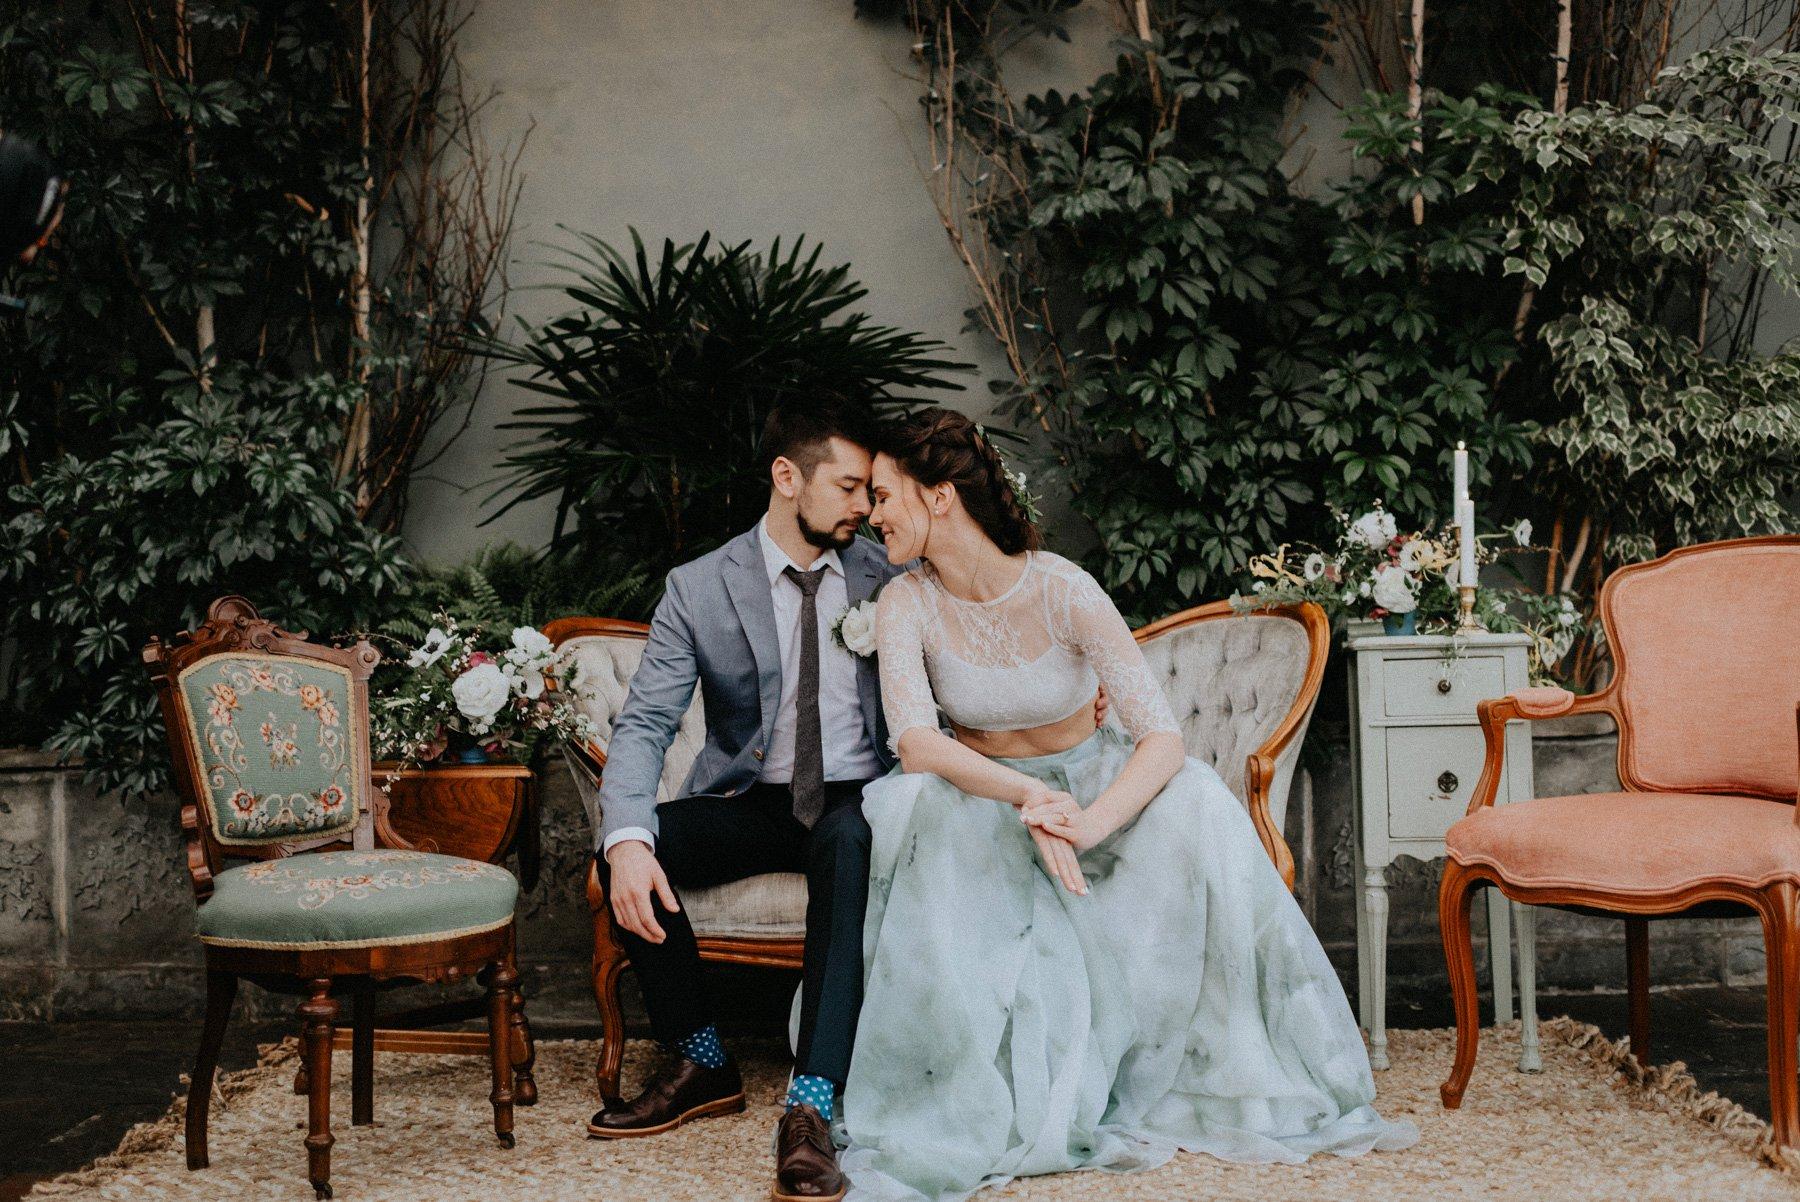 greenhouse-botanical-wedding-41.jpg